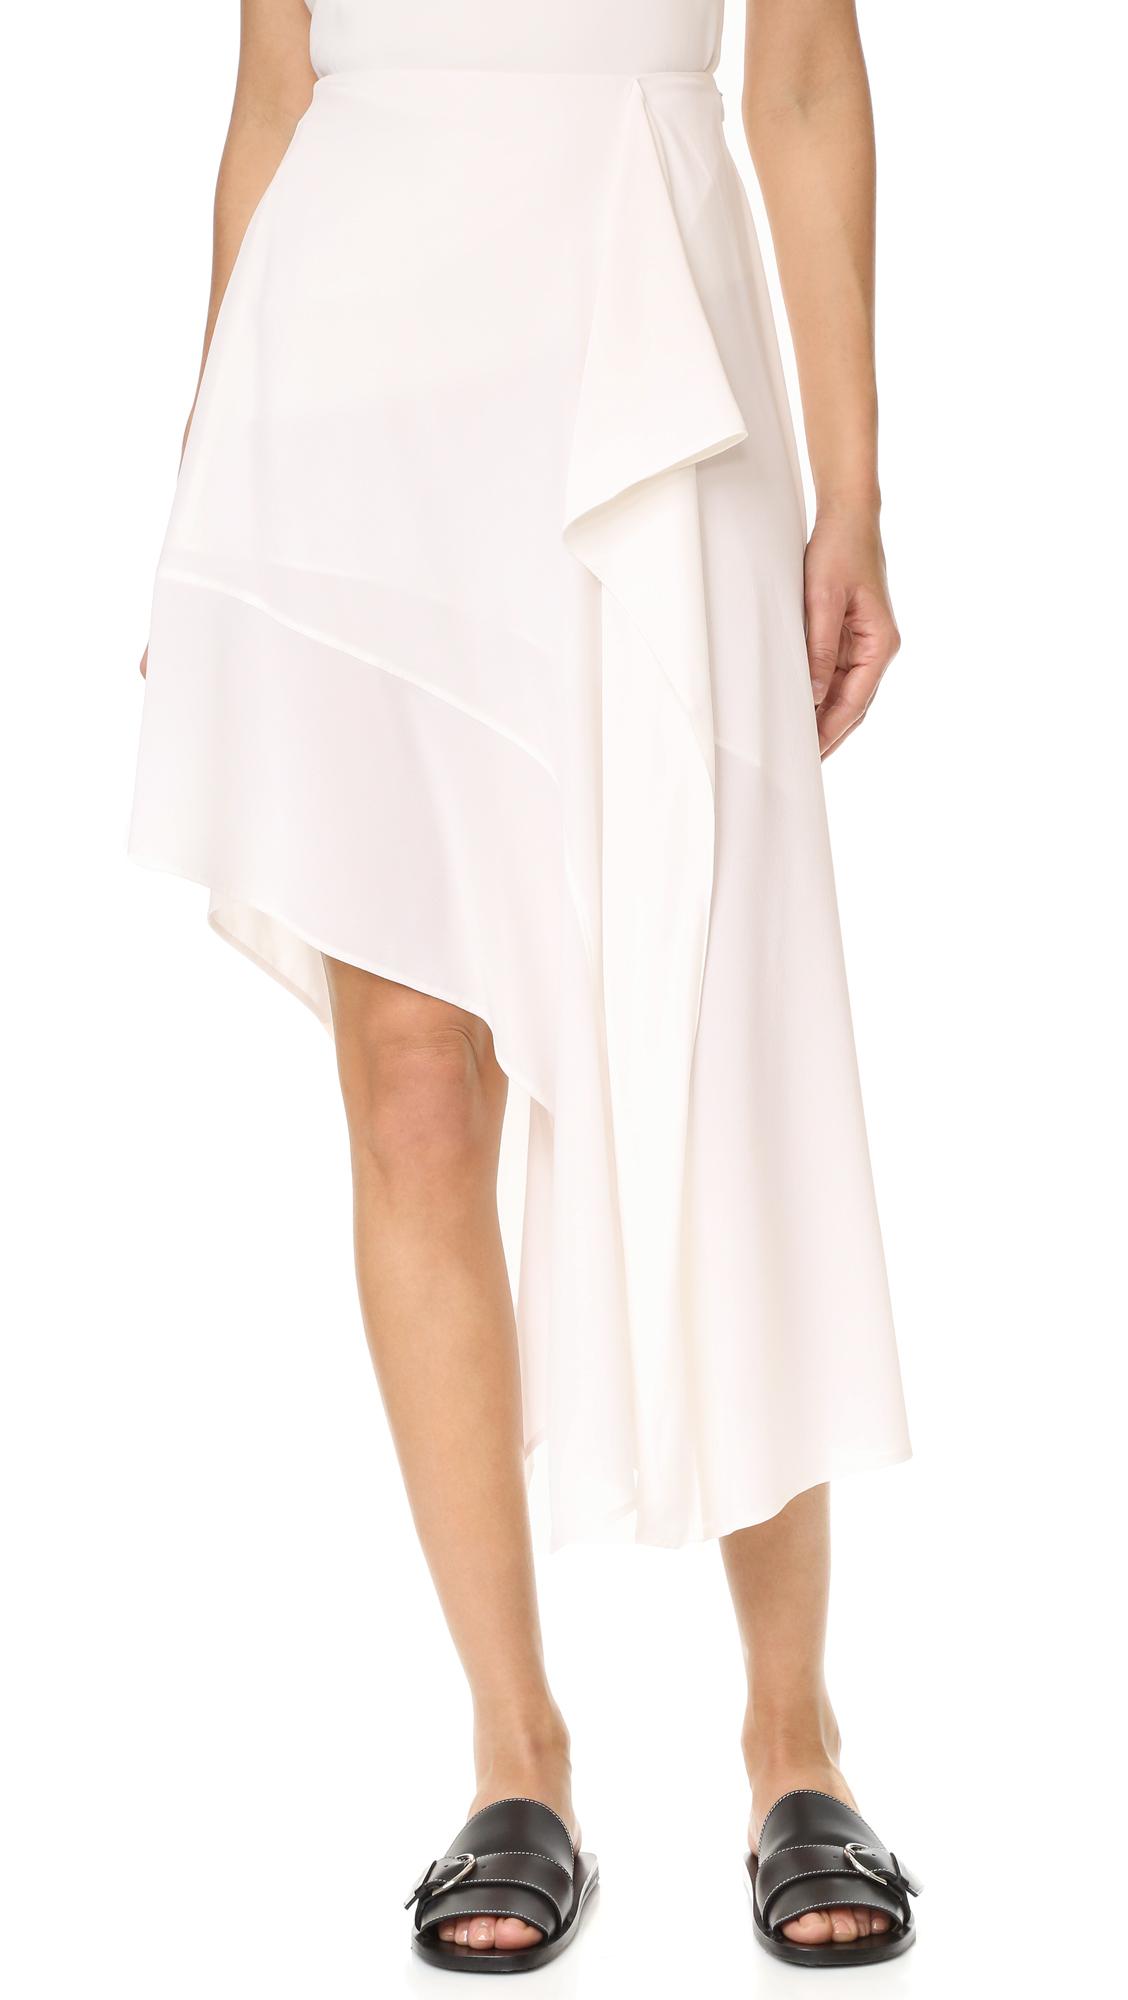 Acne Studios Pamsan Asymmetrical Skirt - Ivory White at Shopbop